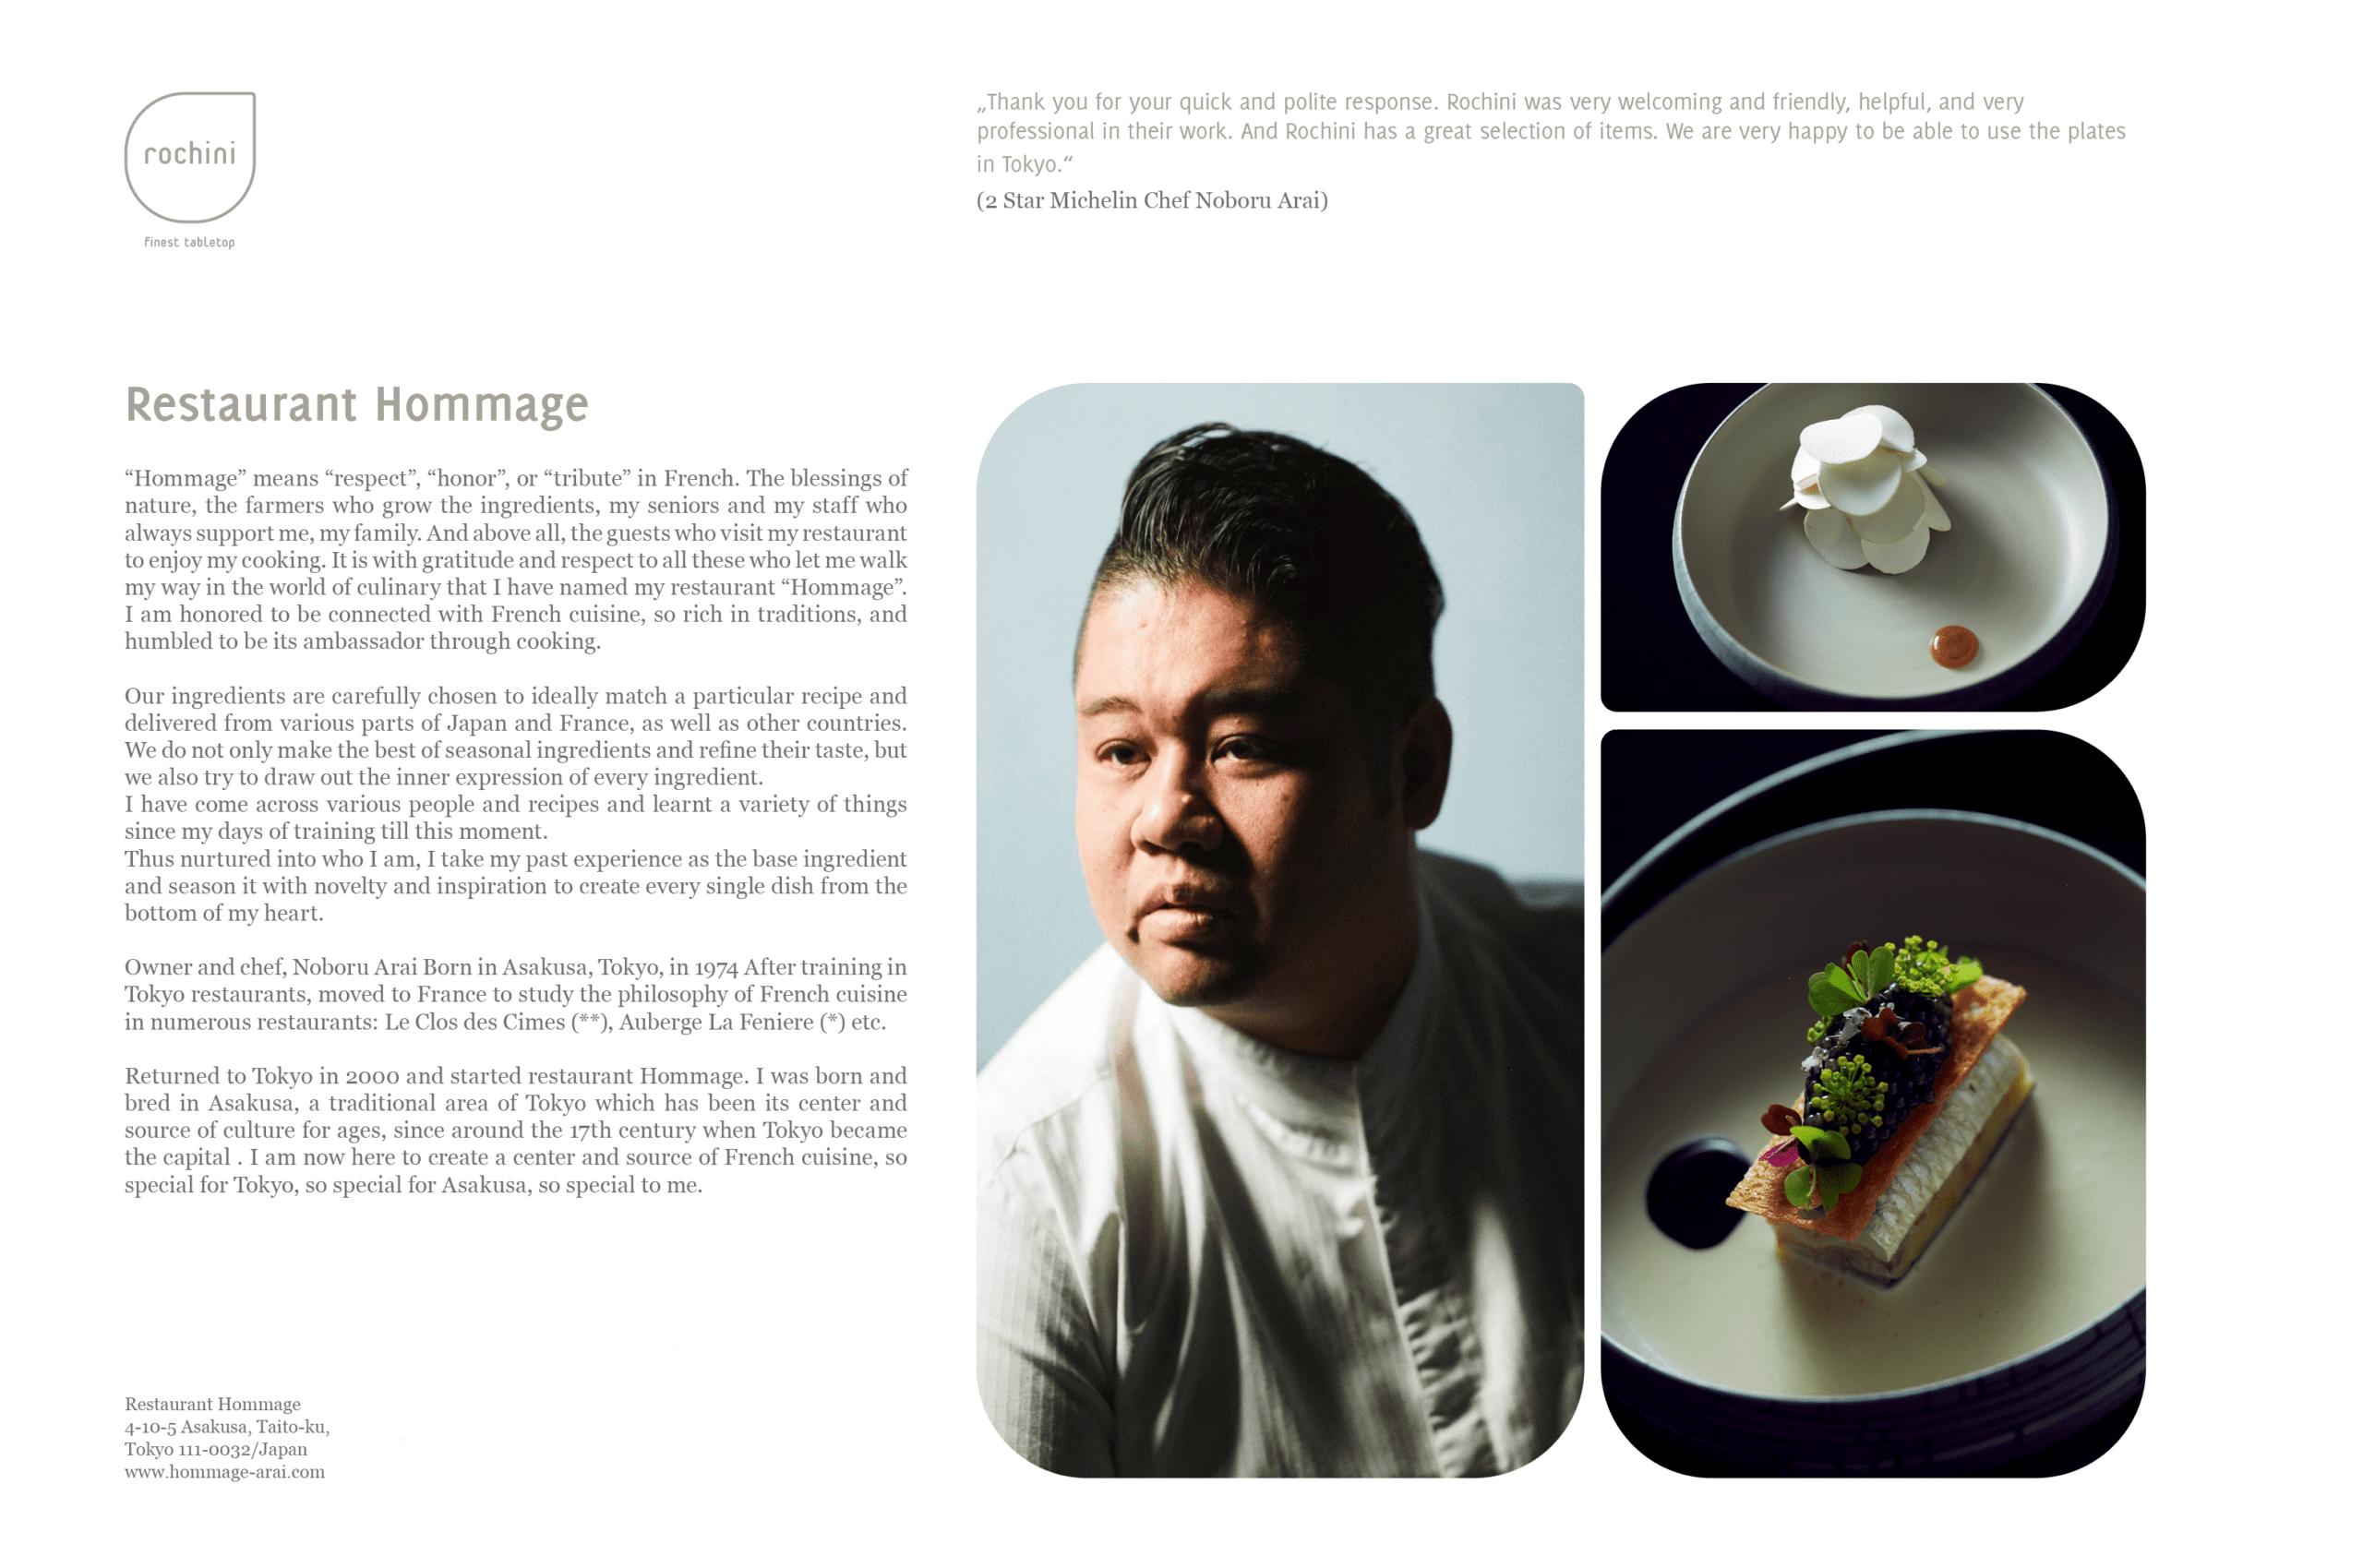 1 2 Star Michelin Chef Noboru Arai   Restaurant Hommage Tokyo meets Rochini